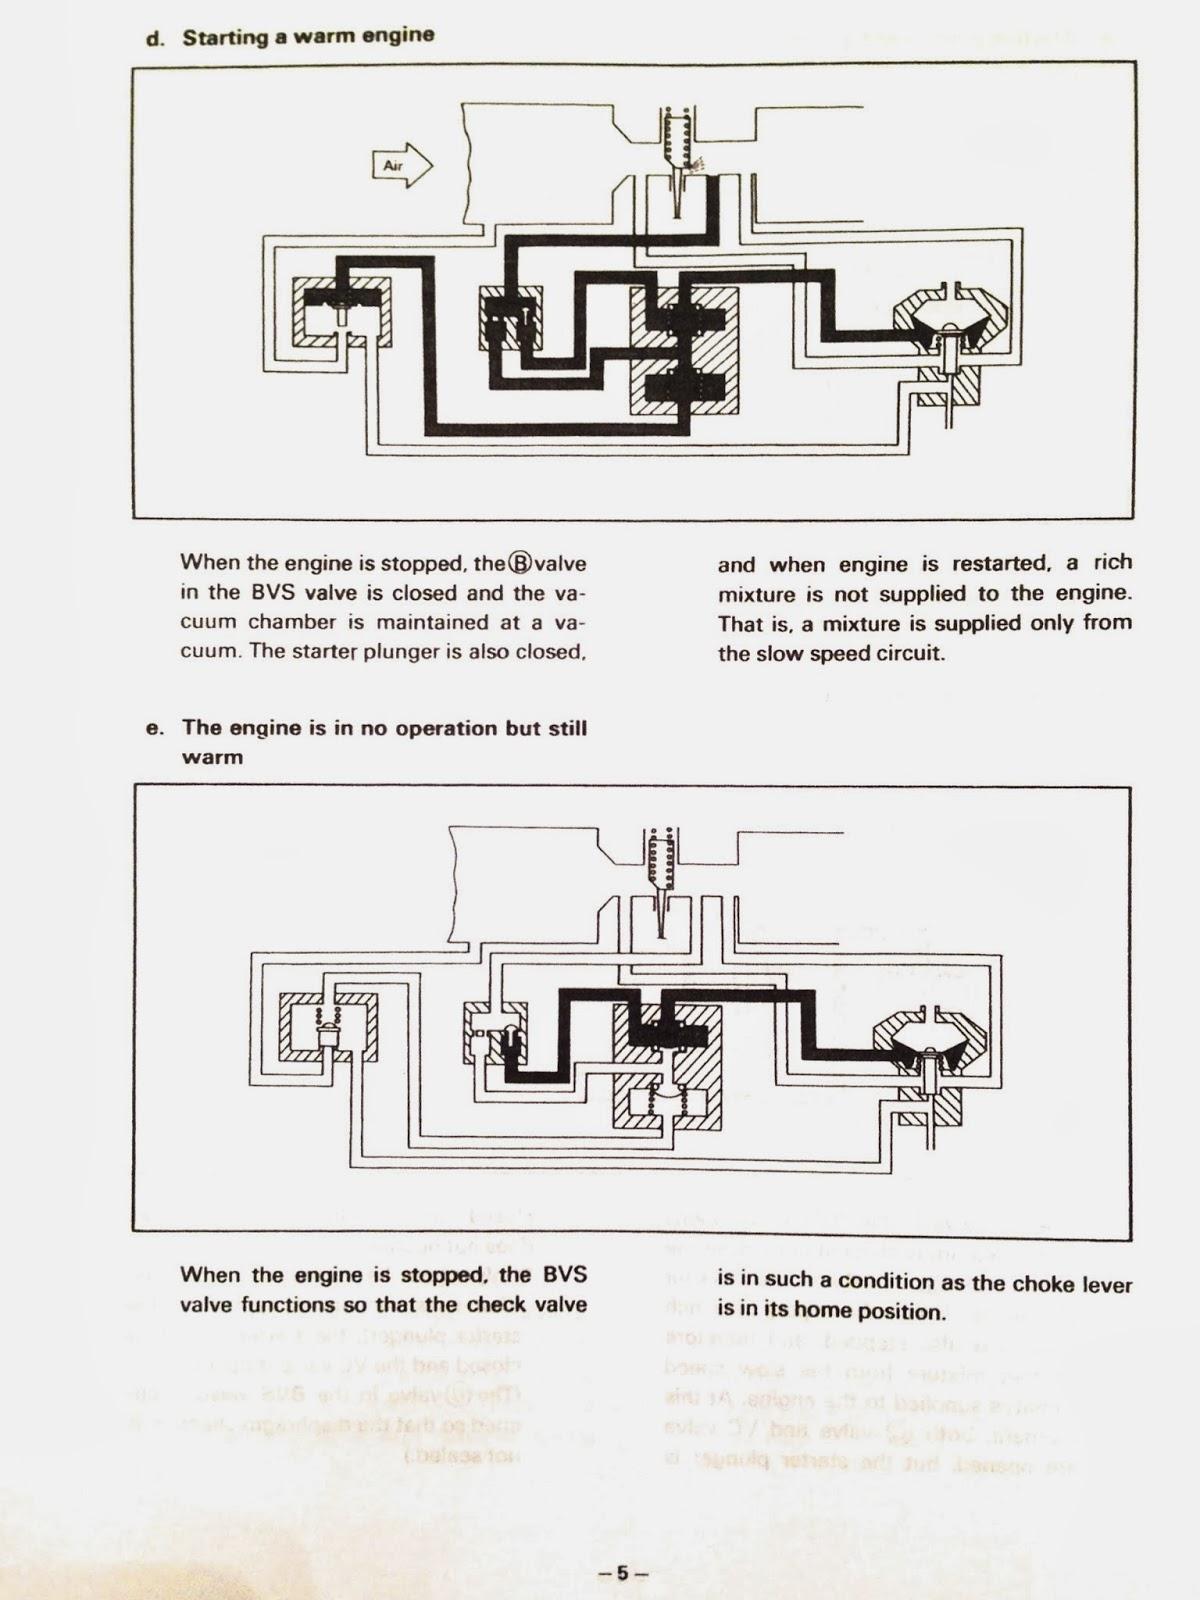 yamaha lc50 yamaha lc50 service manual rh yamahalc50 blogspot com Yamaha XS1100 Wiring-Diagram Yamaha Raider Wiring-Diagram